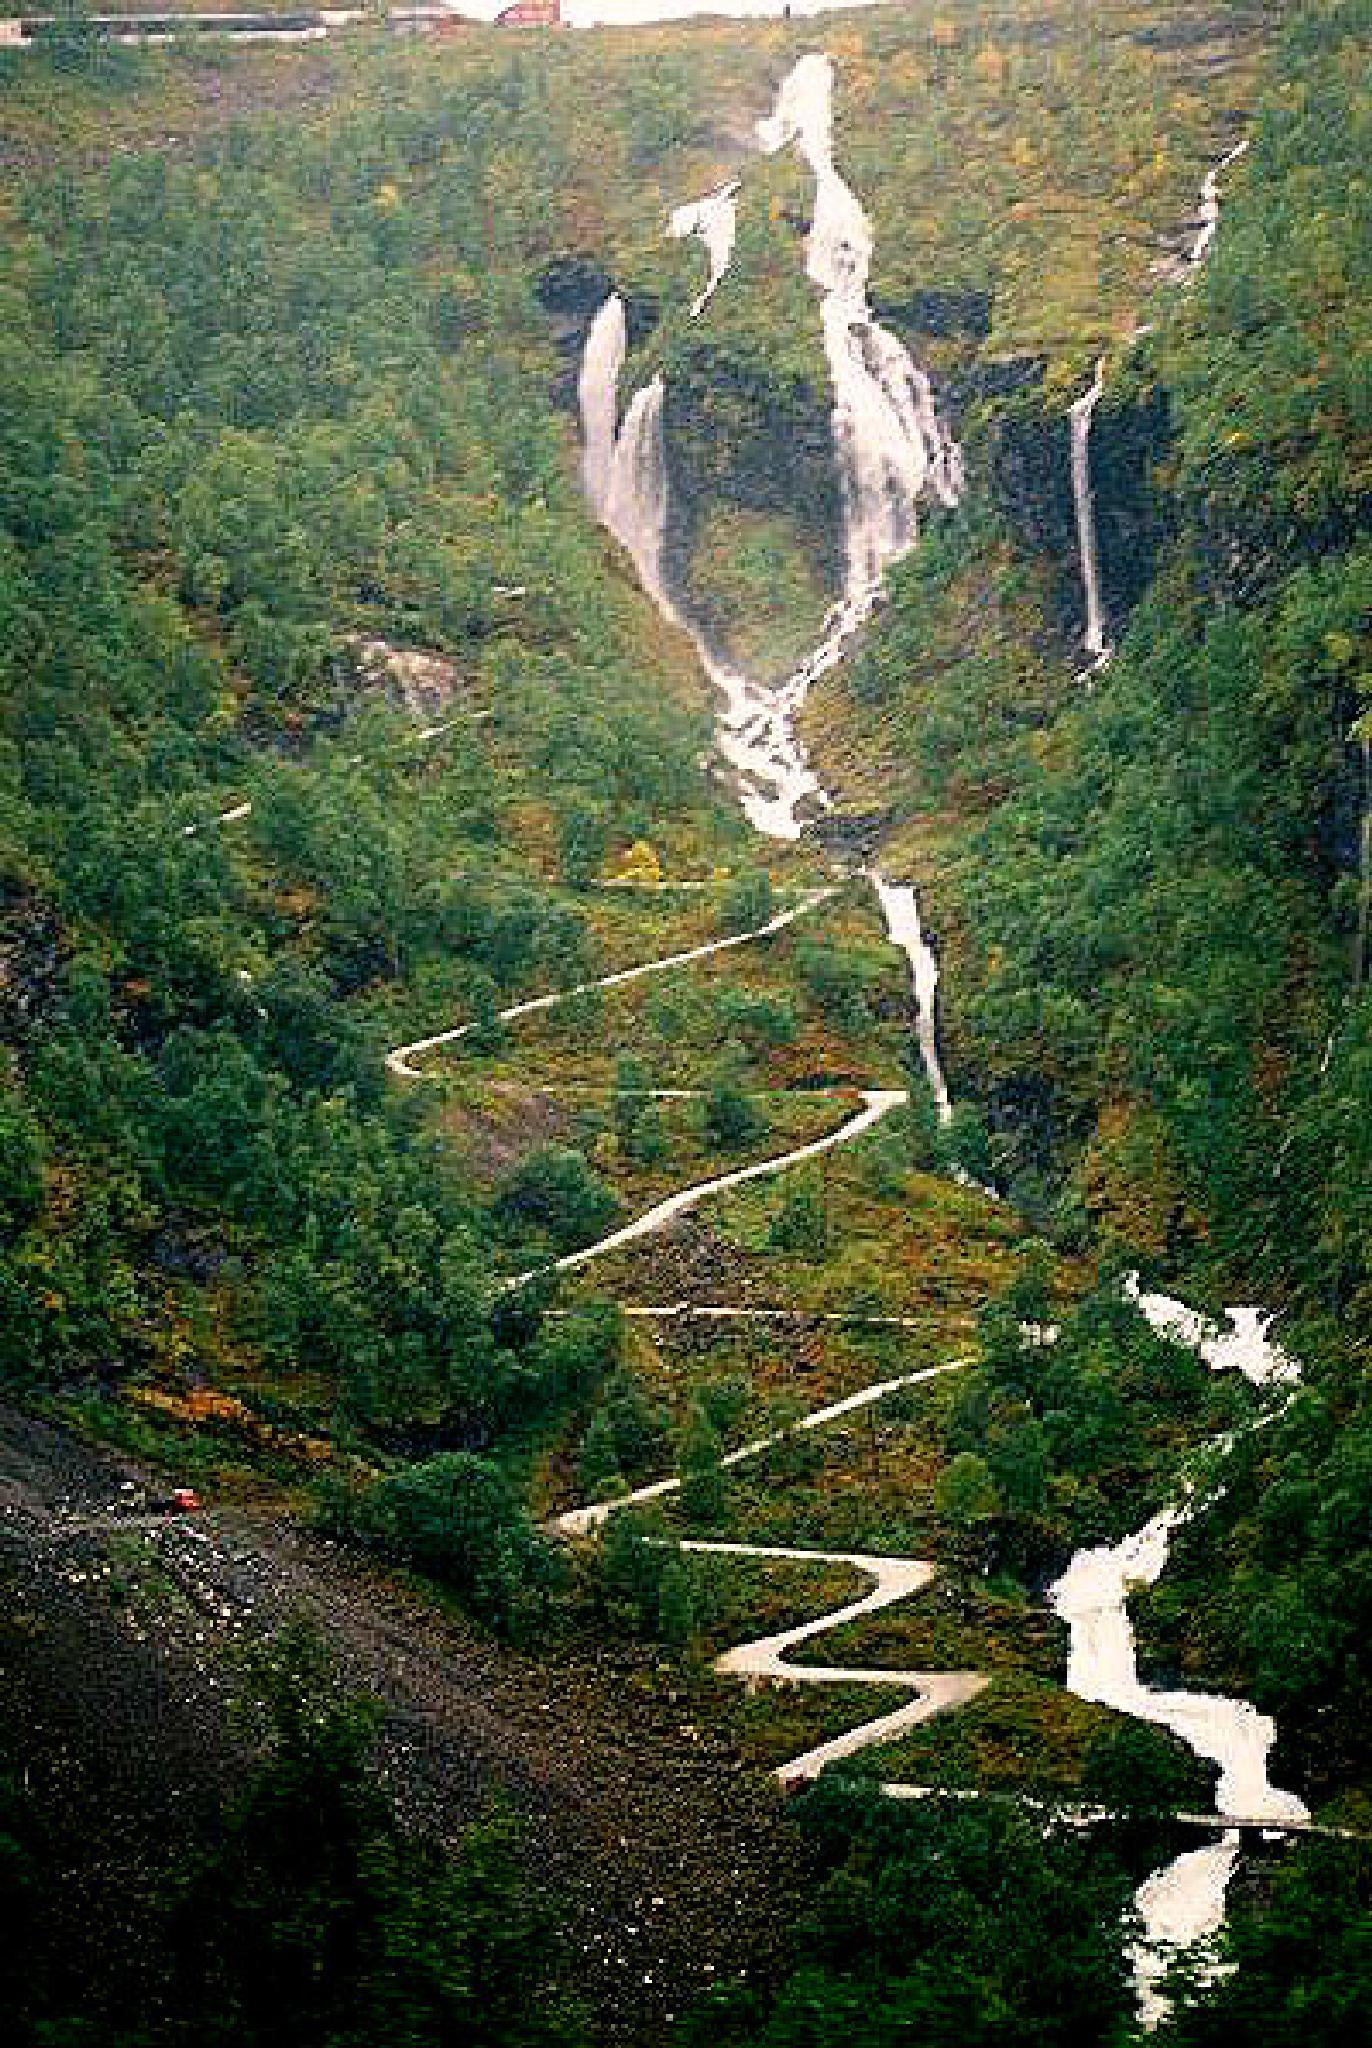 Waterfall by adrian pendlebury